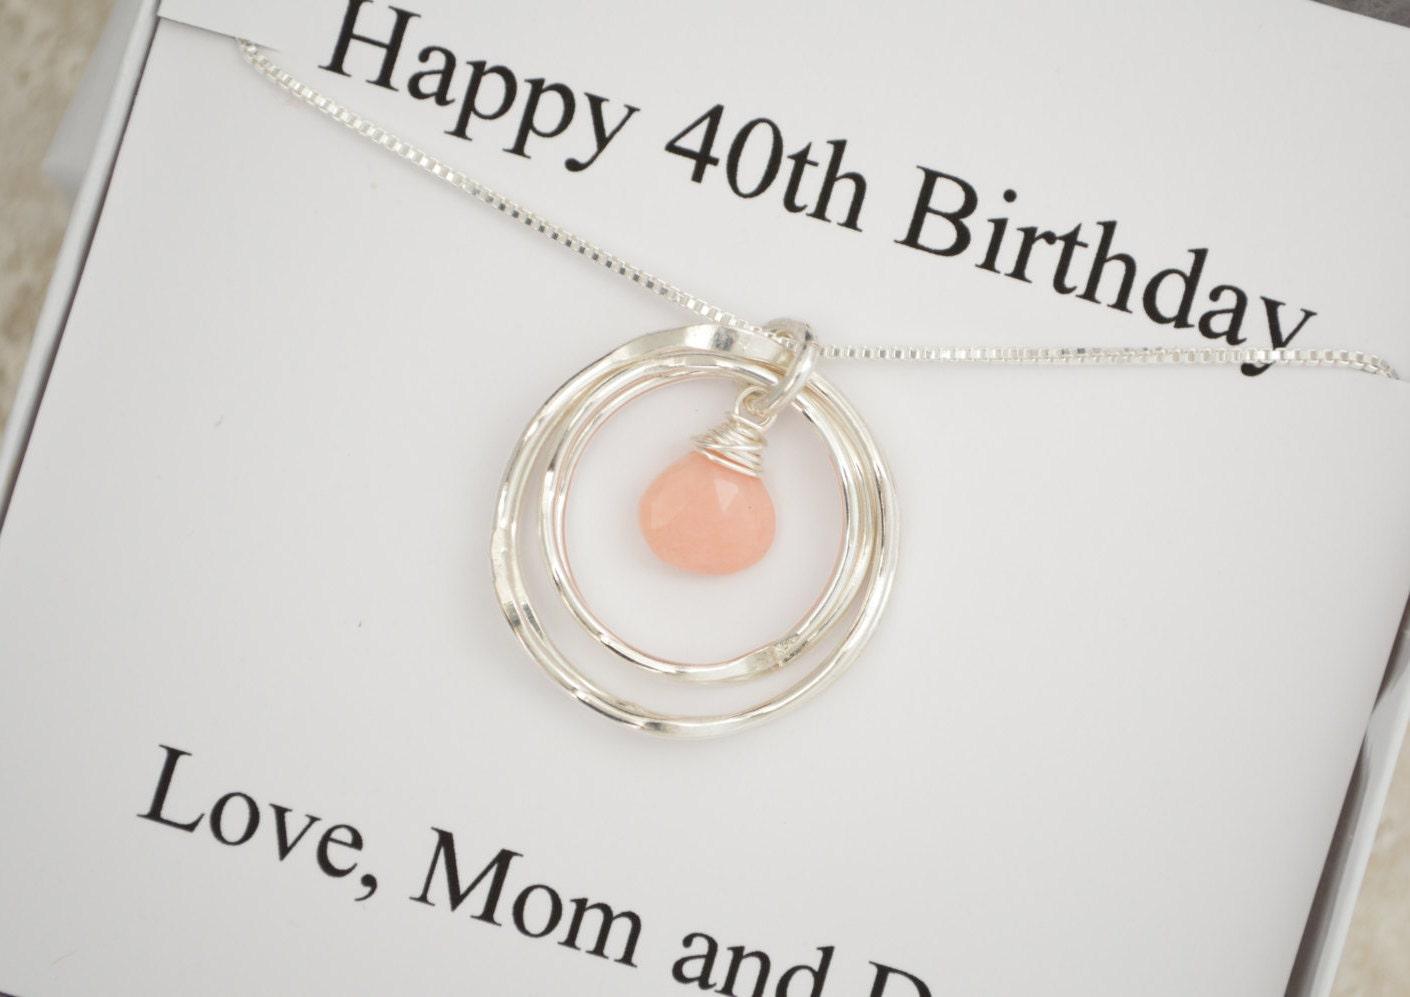 40th Birthday Gift For Her, 40th Birthday Gift For Women